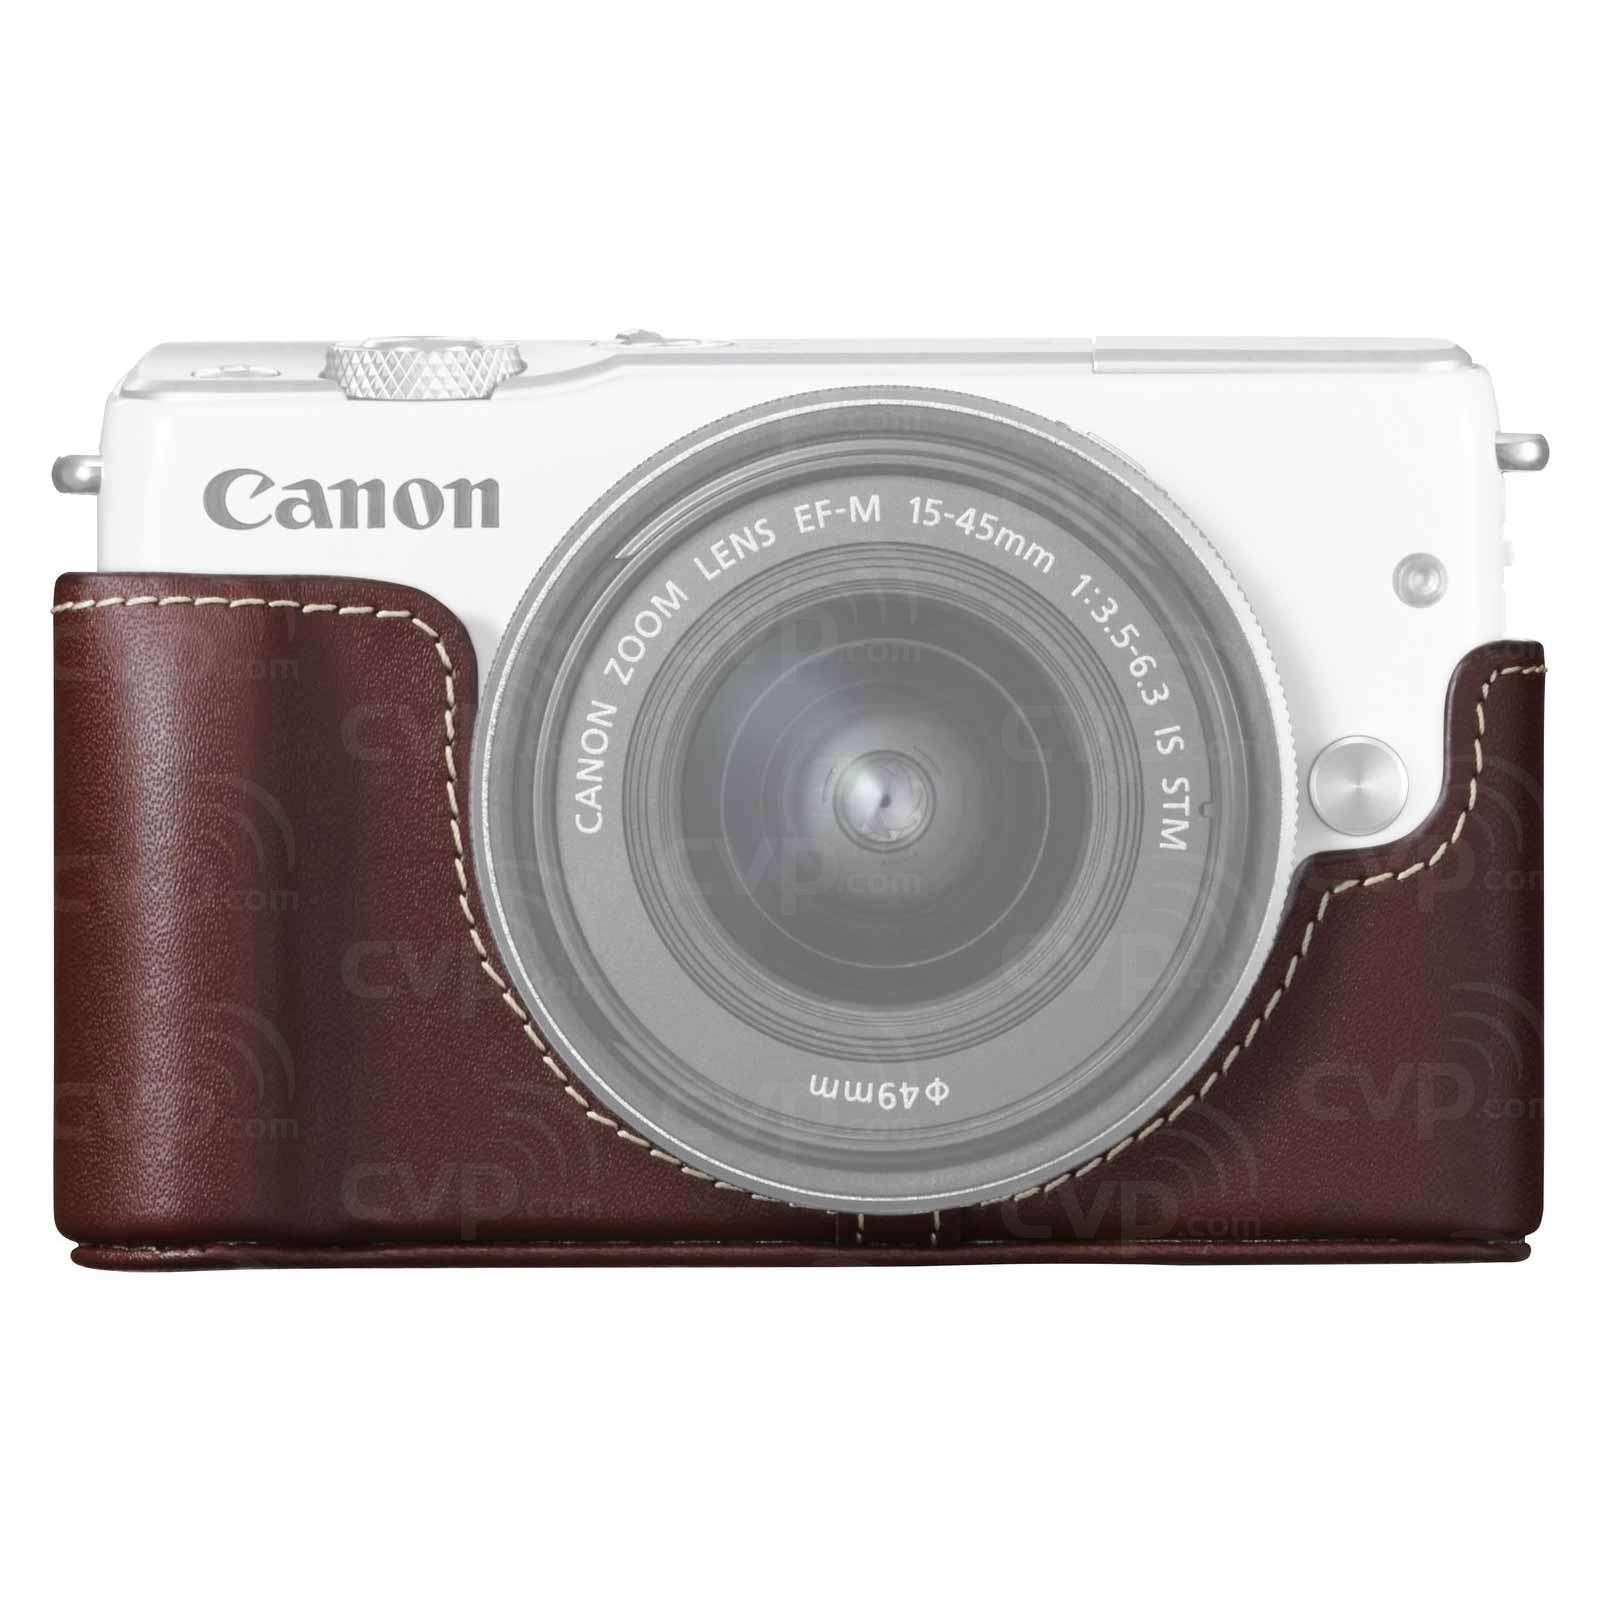 Canon EH28-CJ Body Jacket